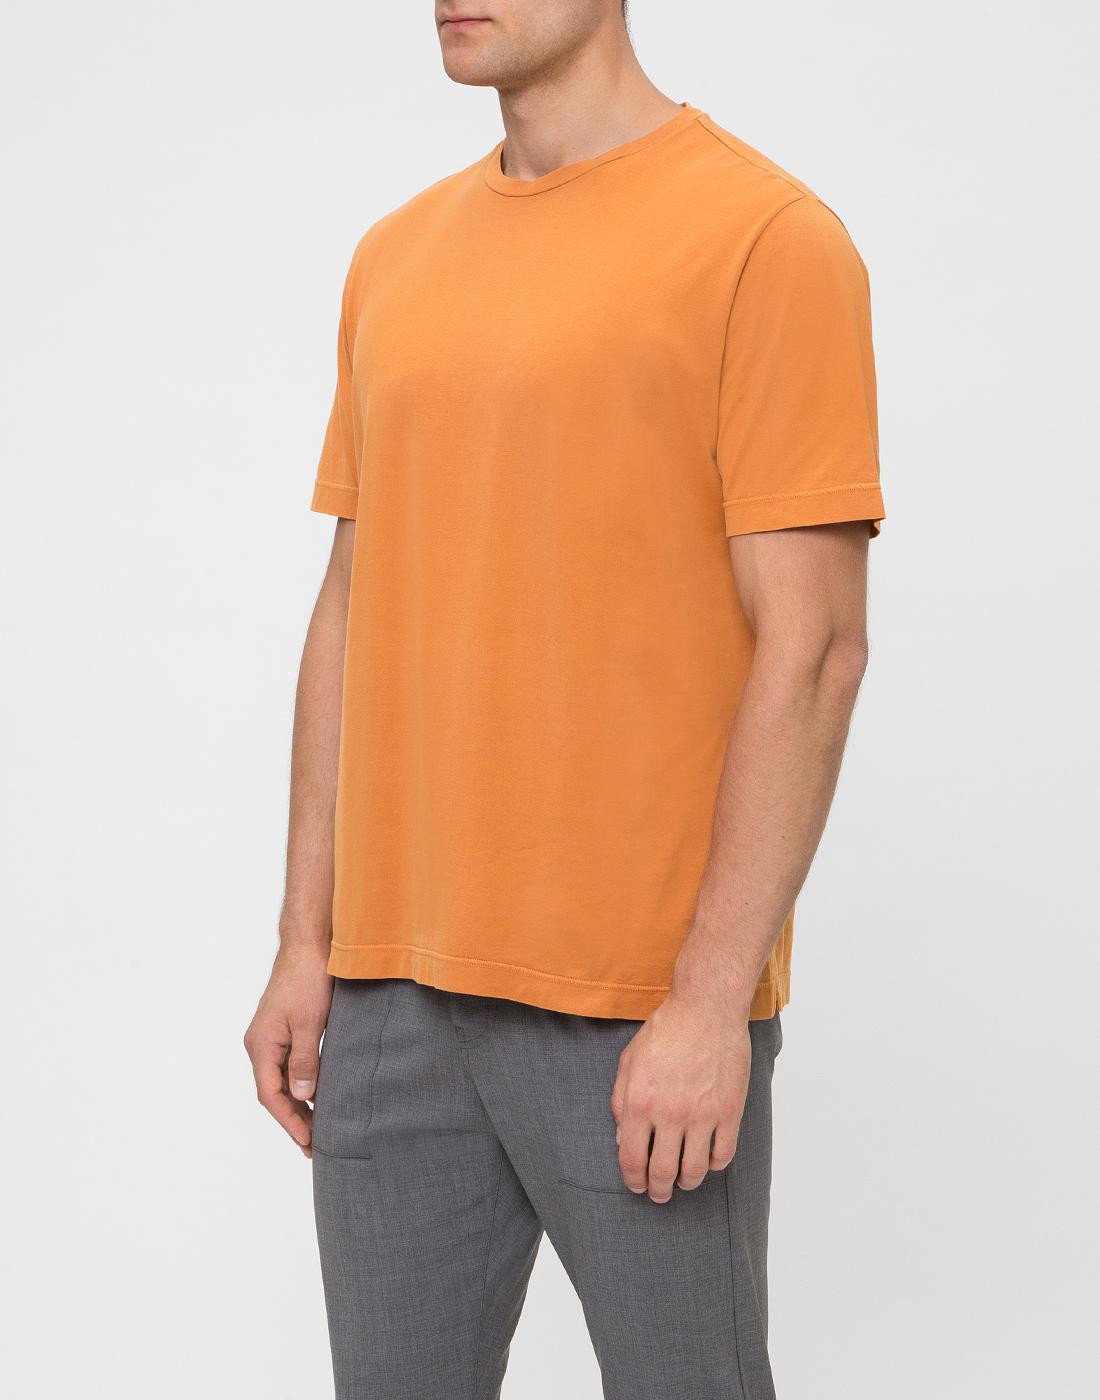 Мужская оранжевая футболка Capobianco S4M660.AL01 ARANCIONE-3